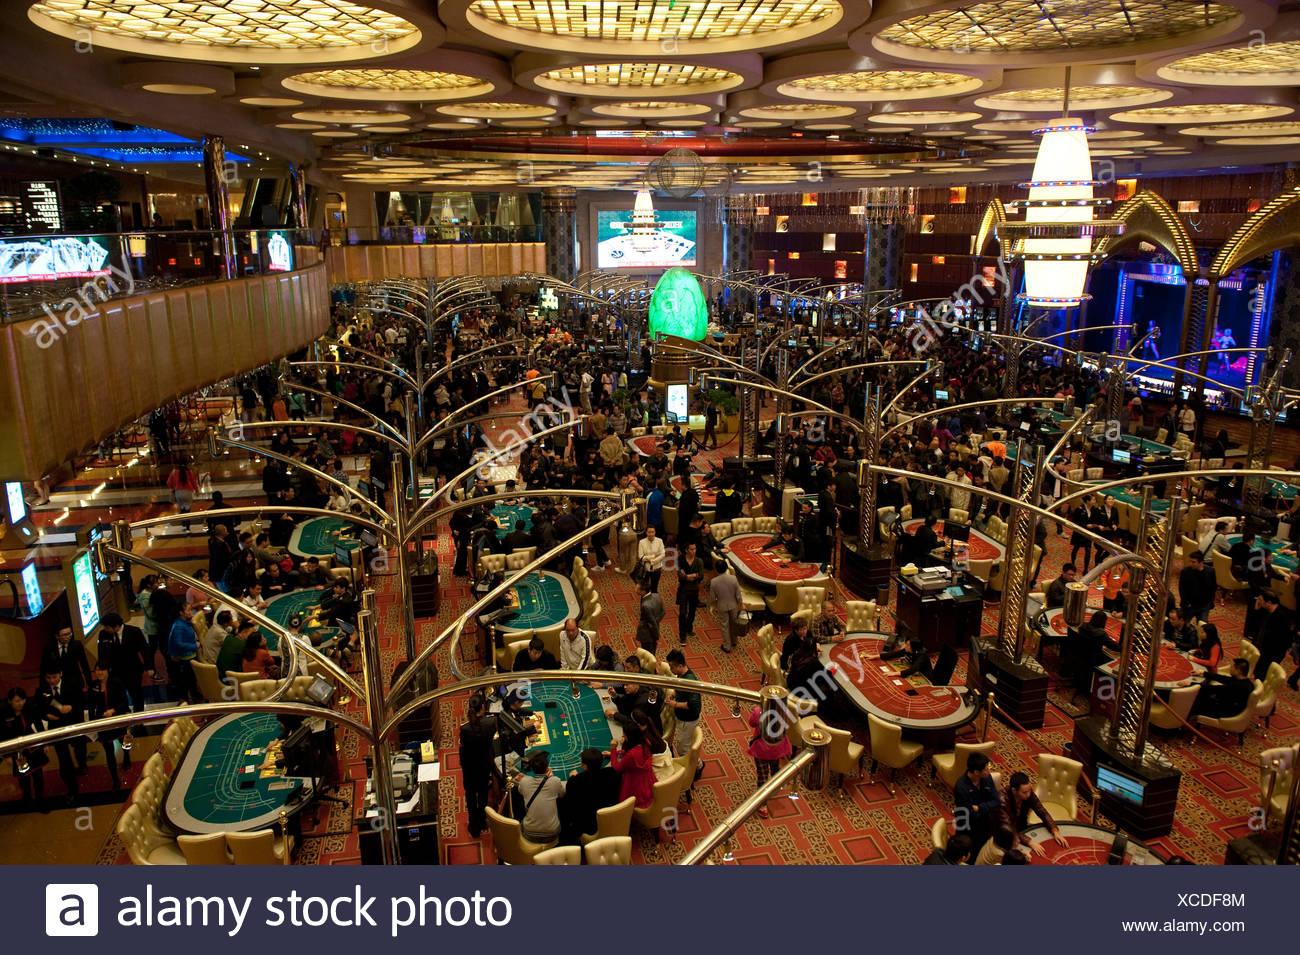 Macao China Gambling Stock Photos Macao China Gambling Stock Images Alamy